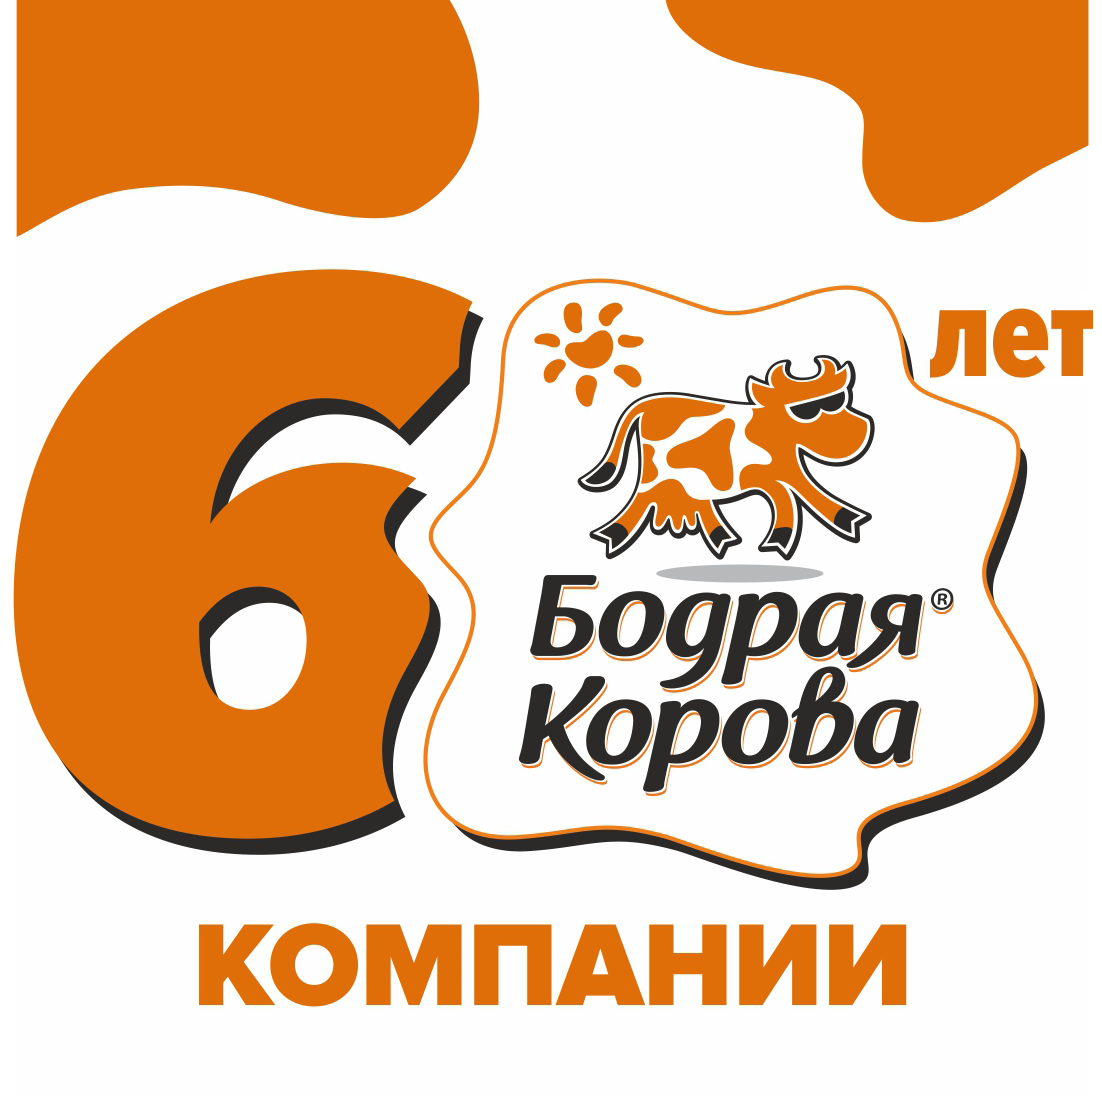 Белгородский хладокомбинат. Жаркие дни 60-летнего юбилея, фото-2